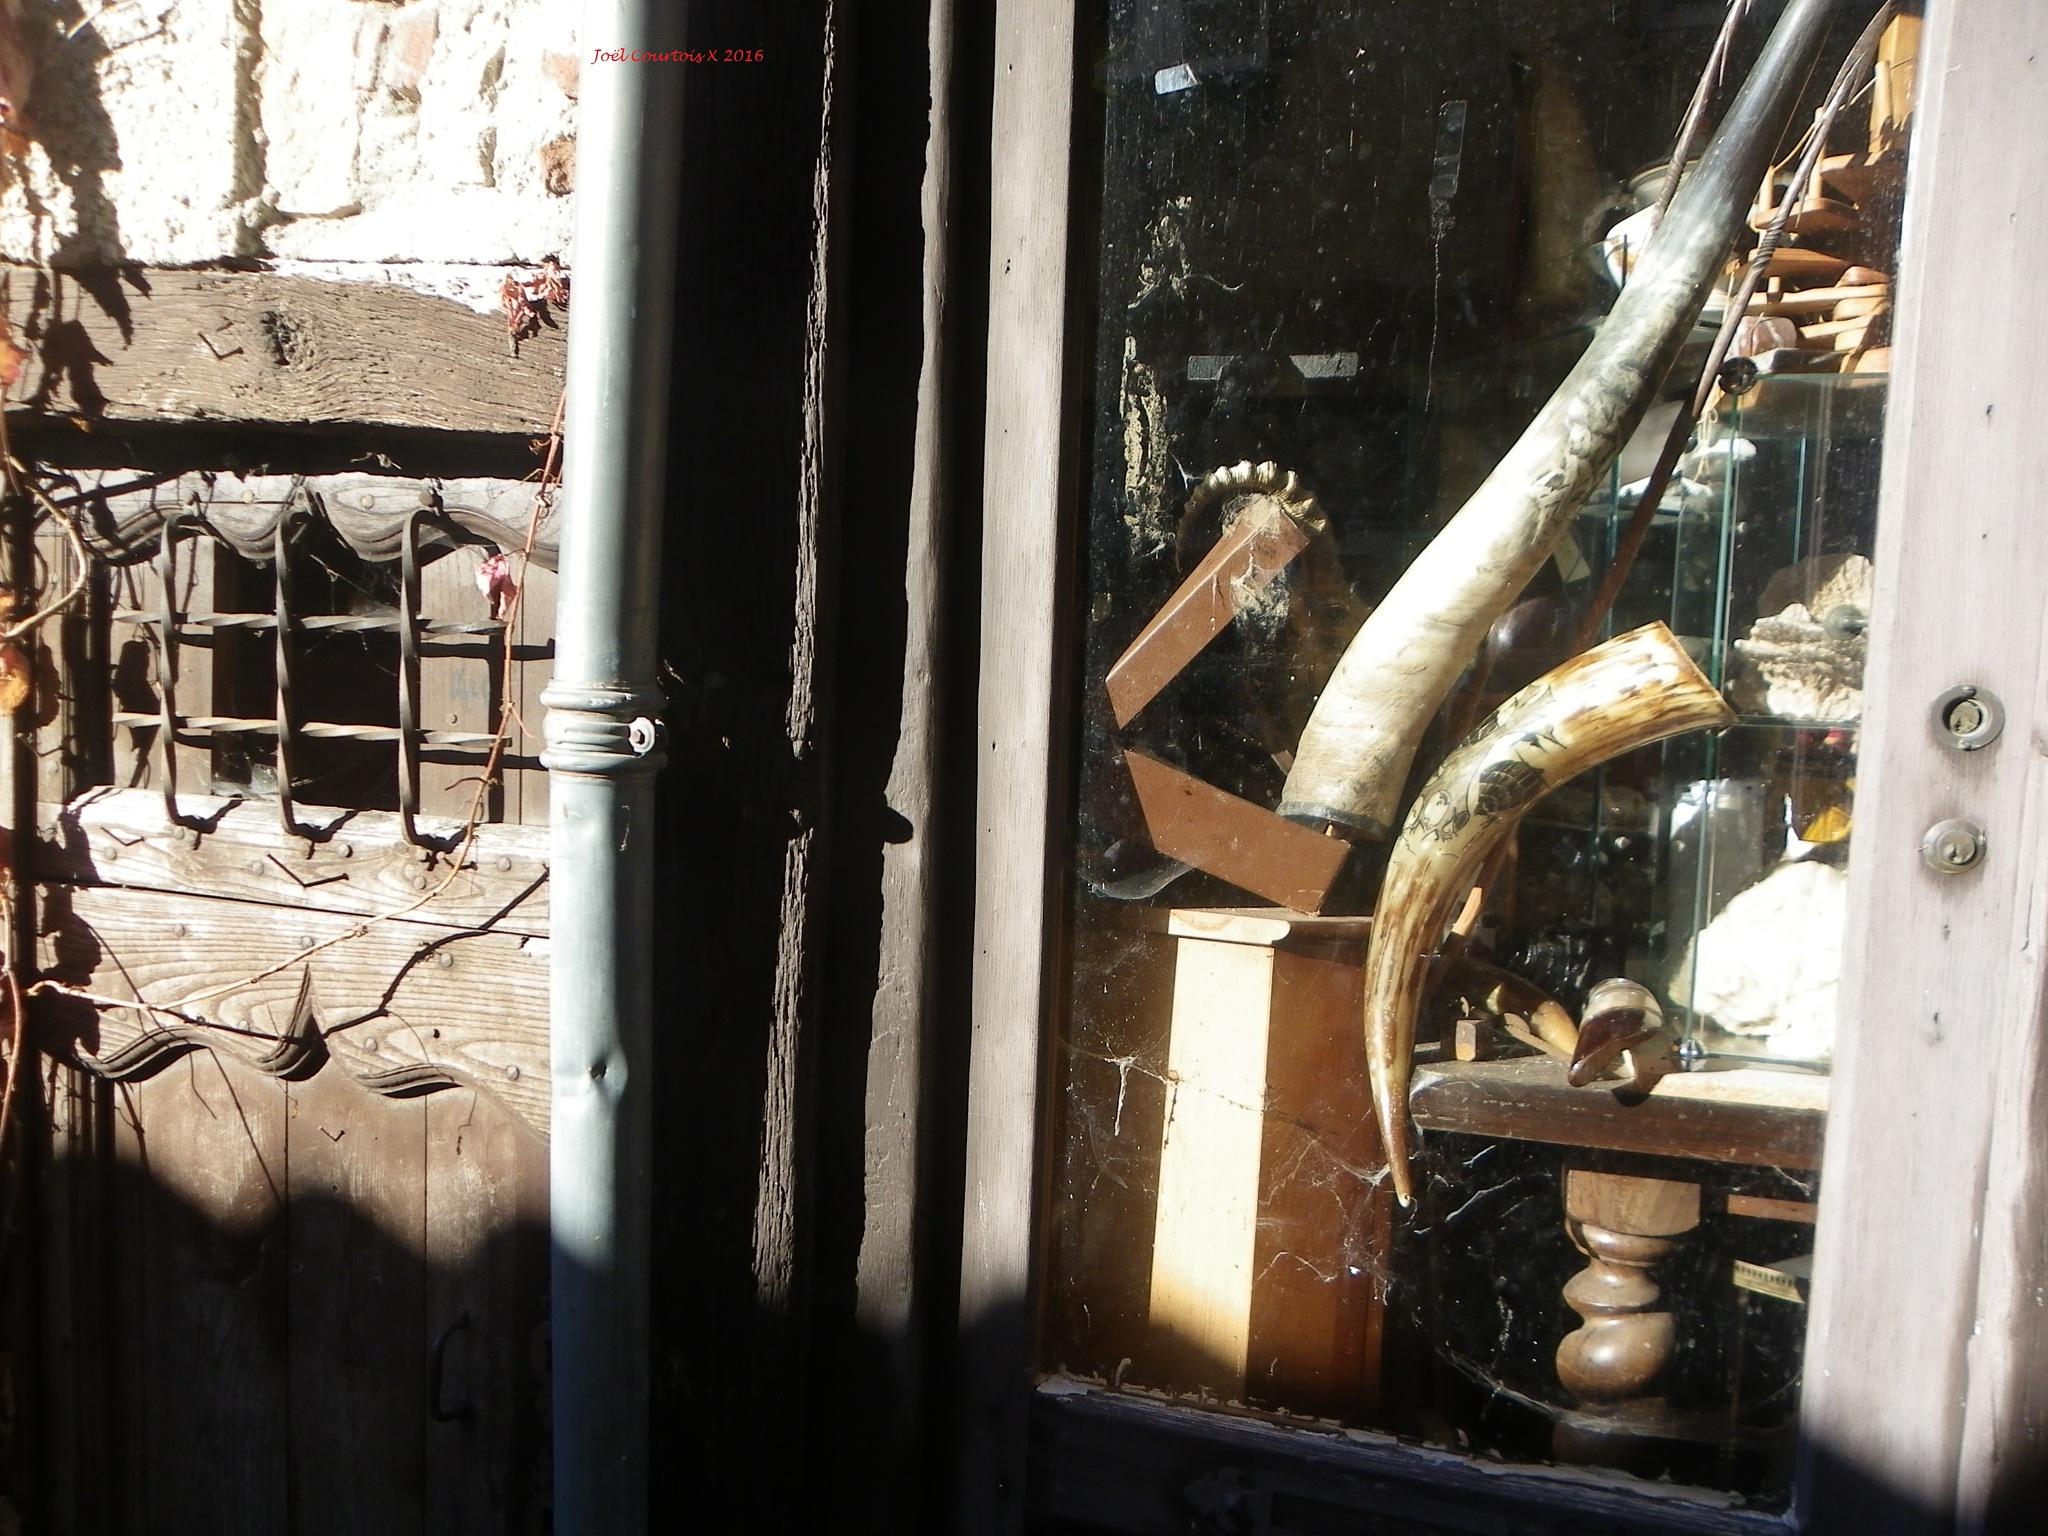 vitrine du sorcier by joel.courtois